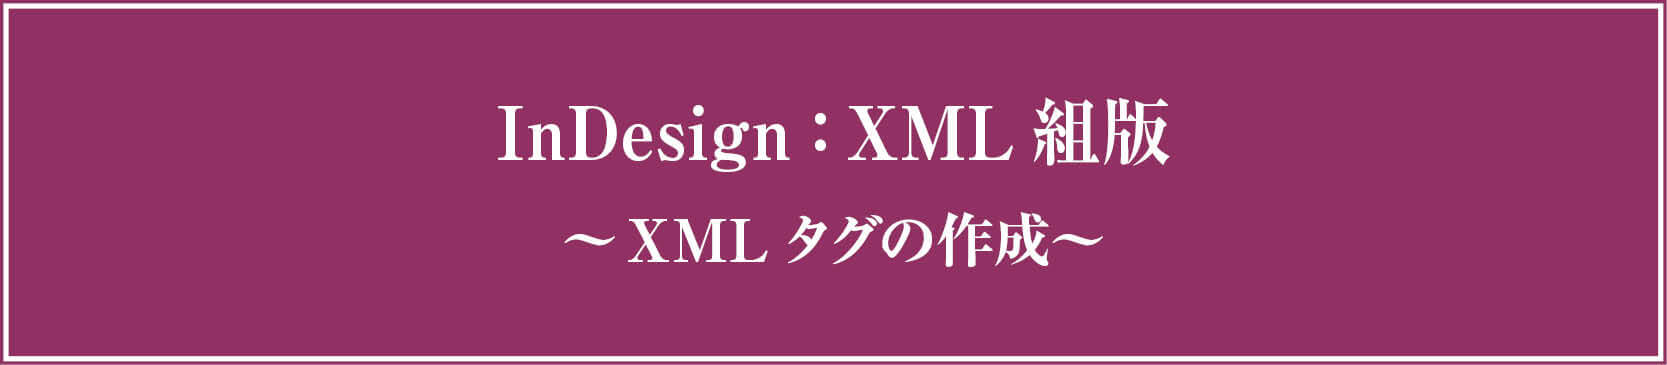 InDesign XMLタグの作成